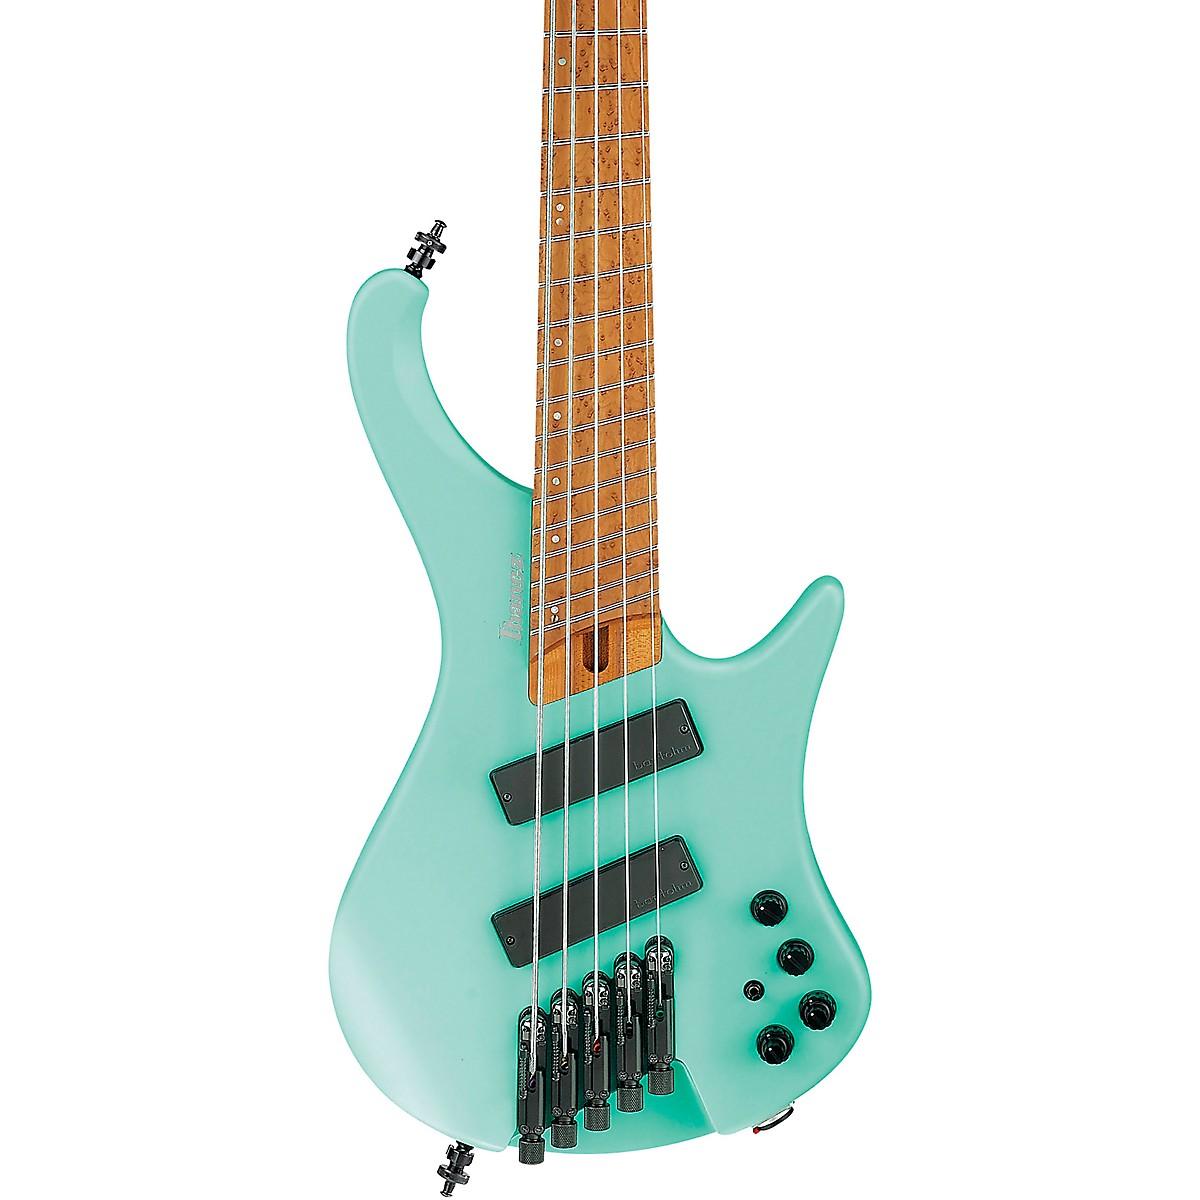 Ibanez EHB1005MS 5-String Multi-Scale Ergonomic Headless Bass